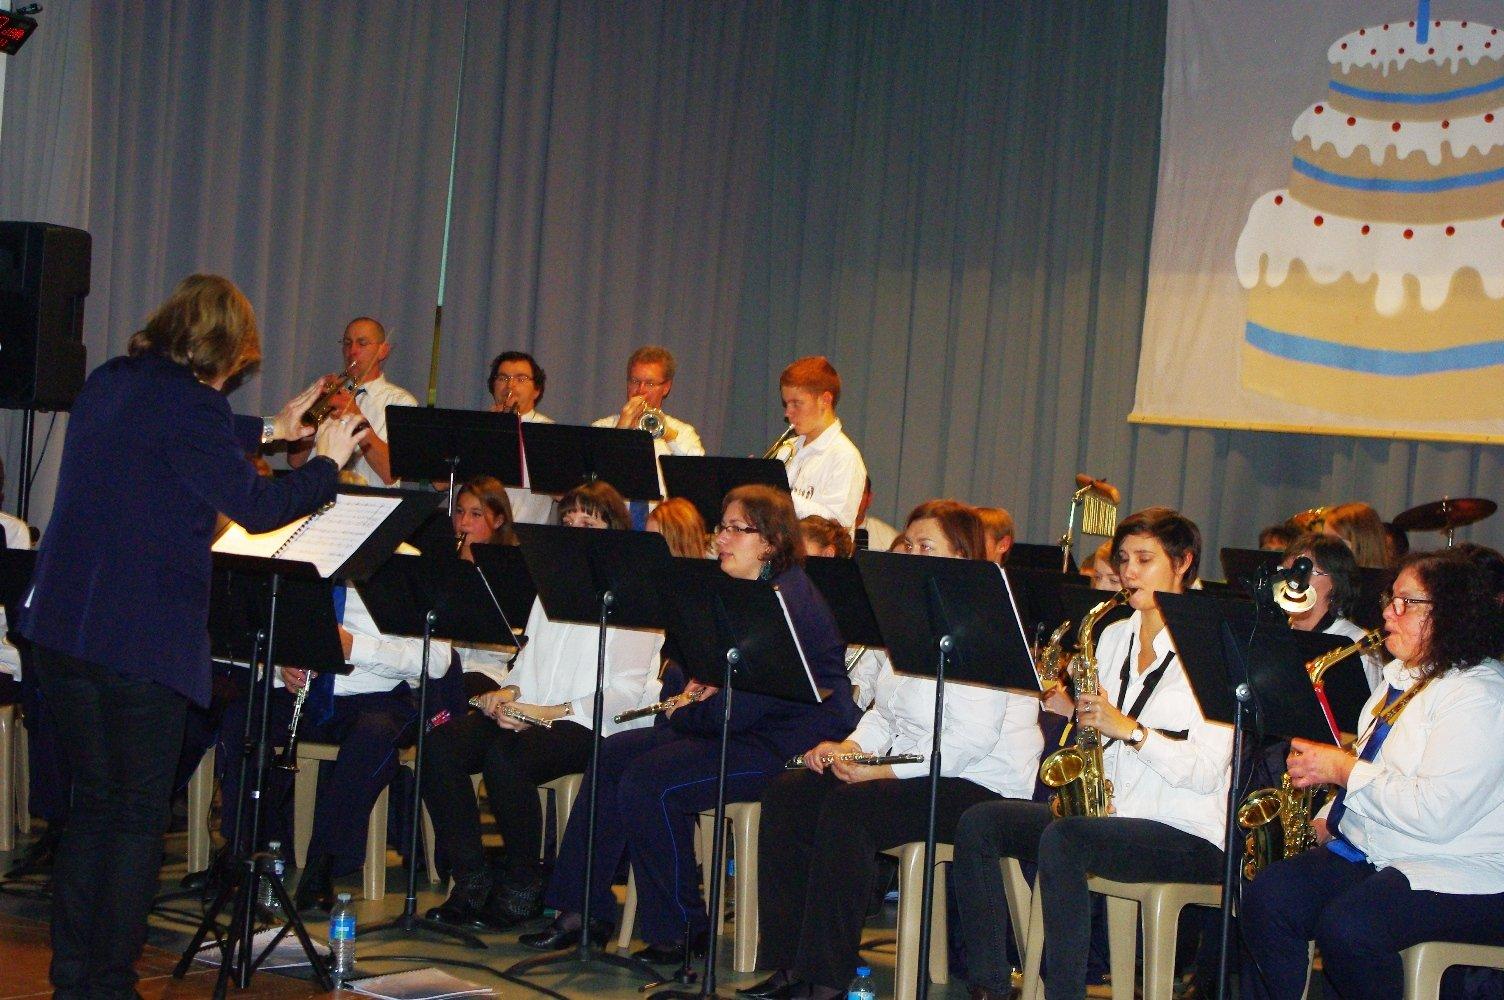 harmonie de Beuvry 2014